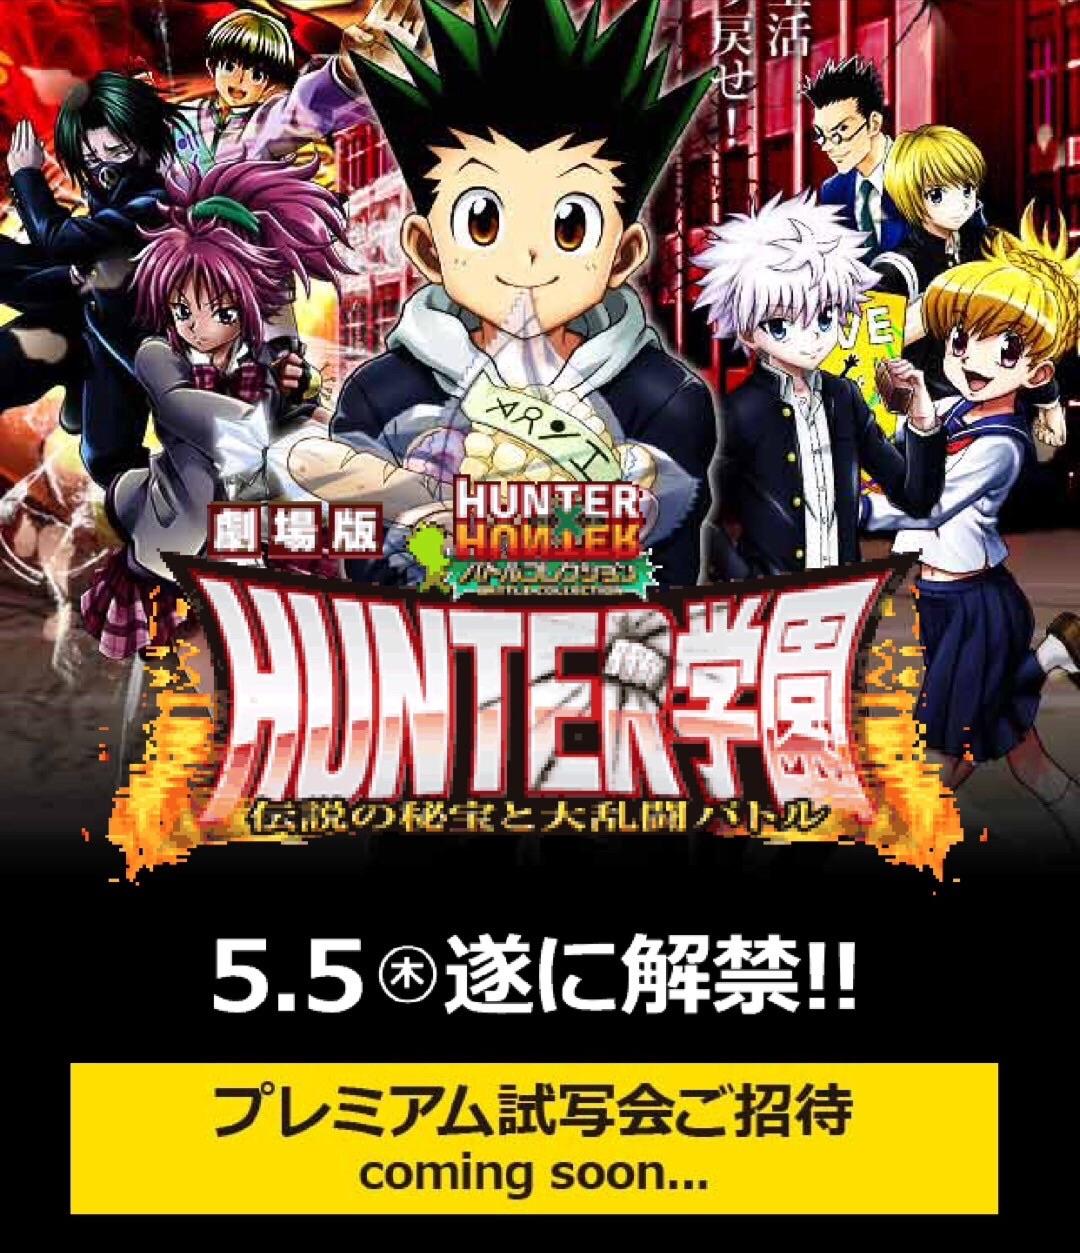 Hunter X Hunter Movie - VietSub (2013)